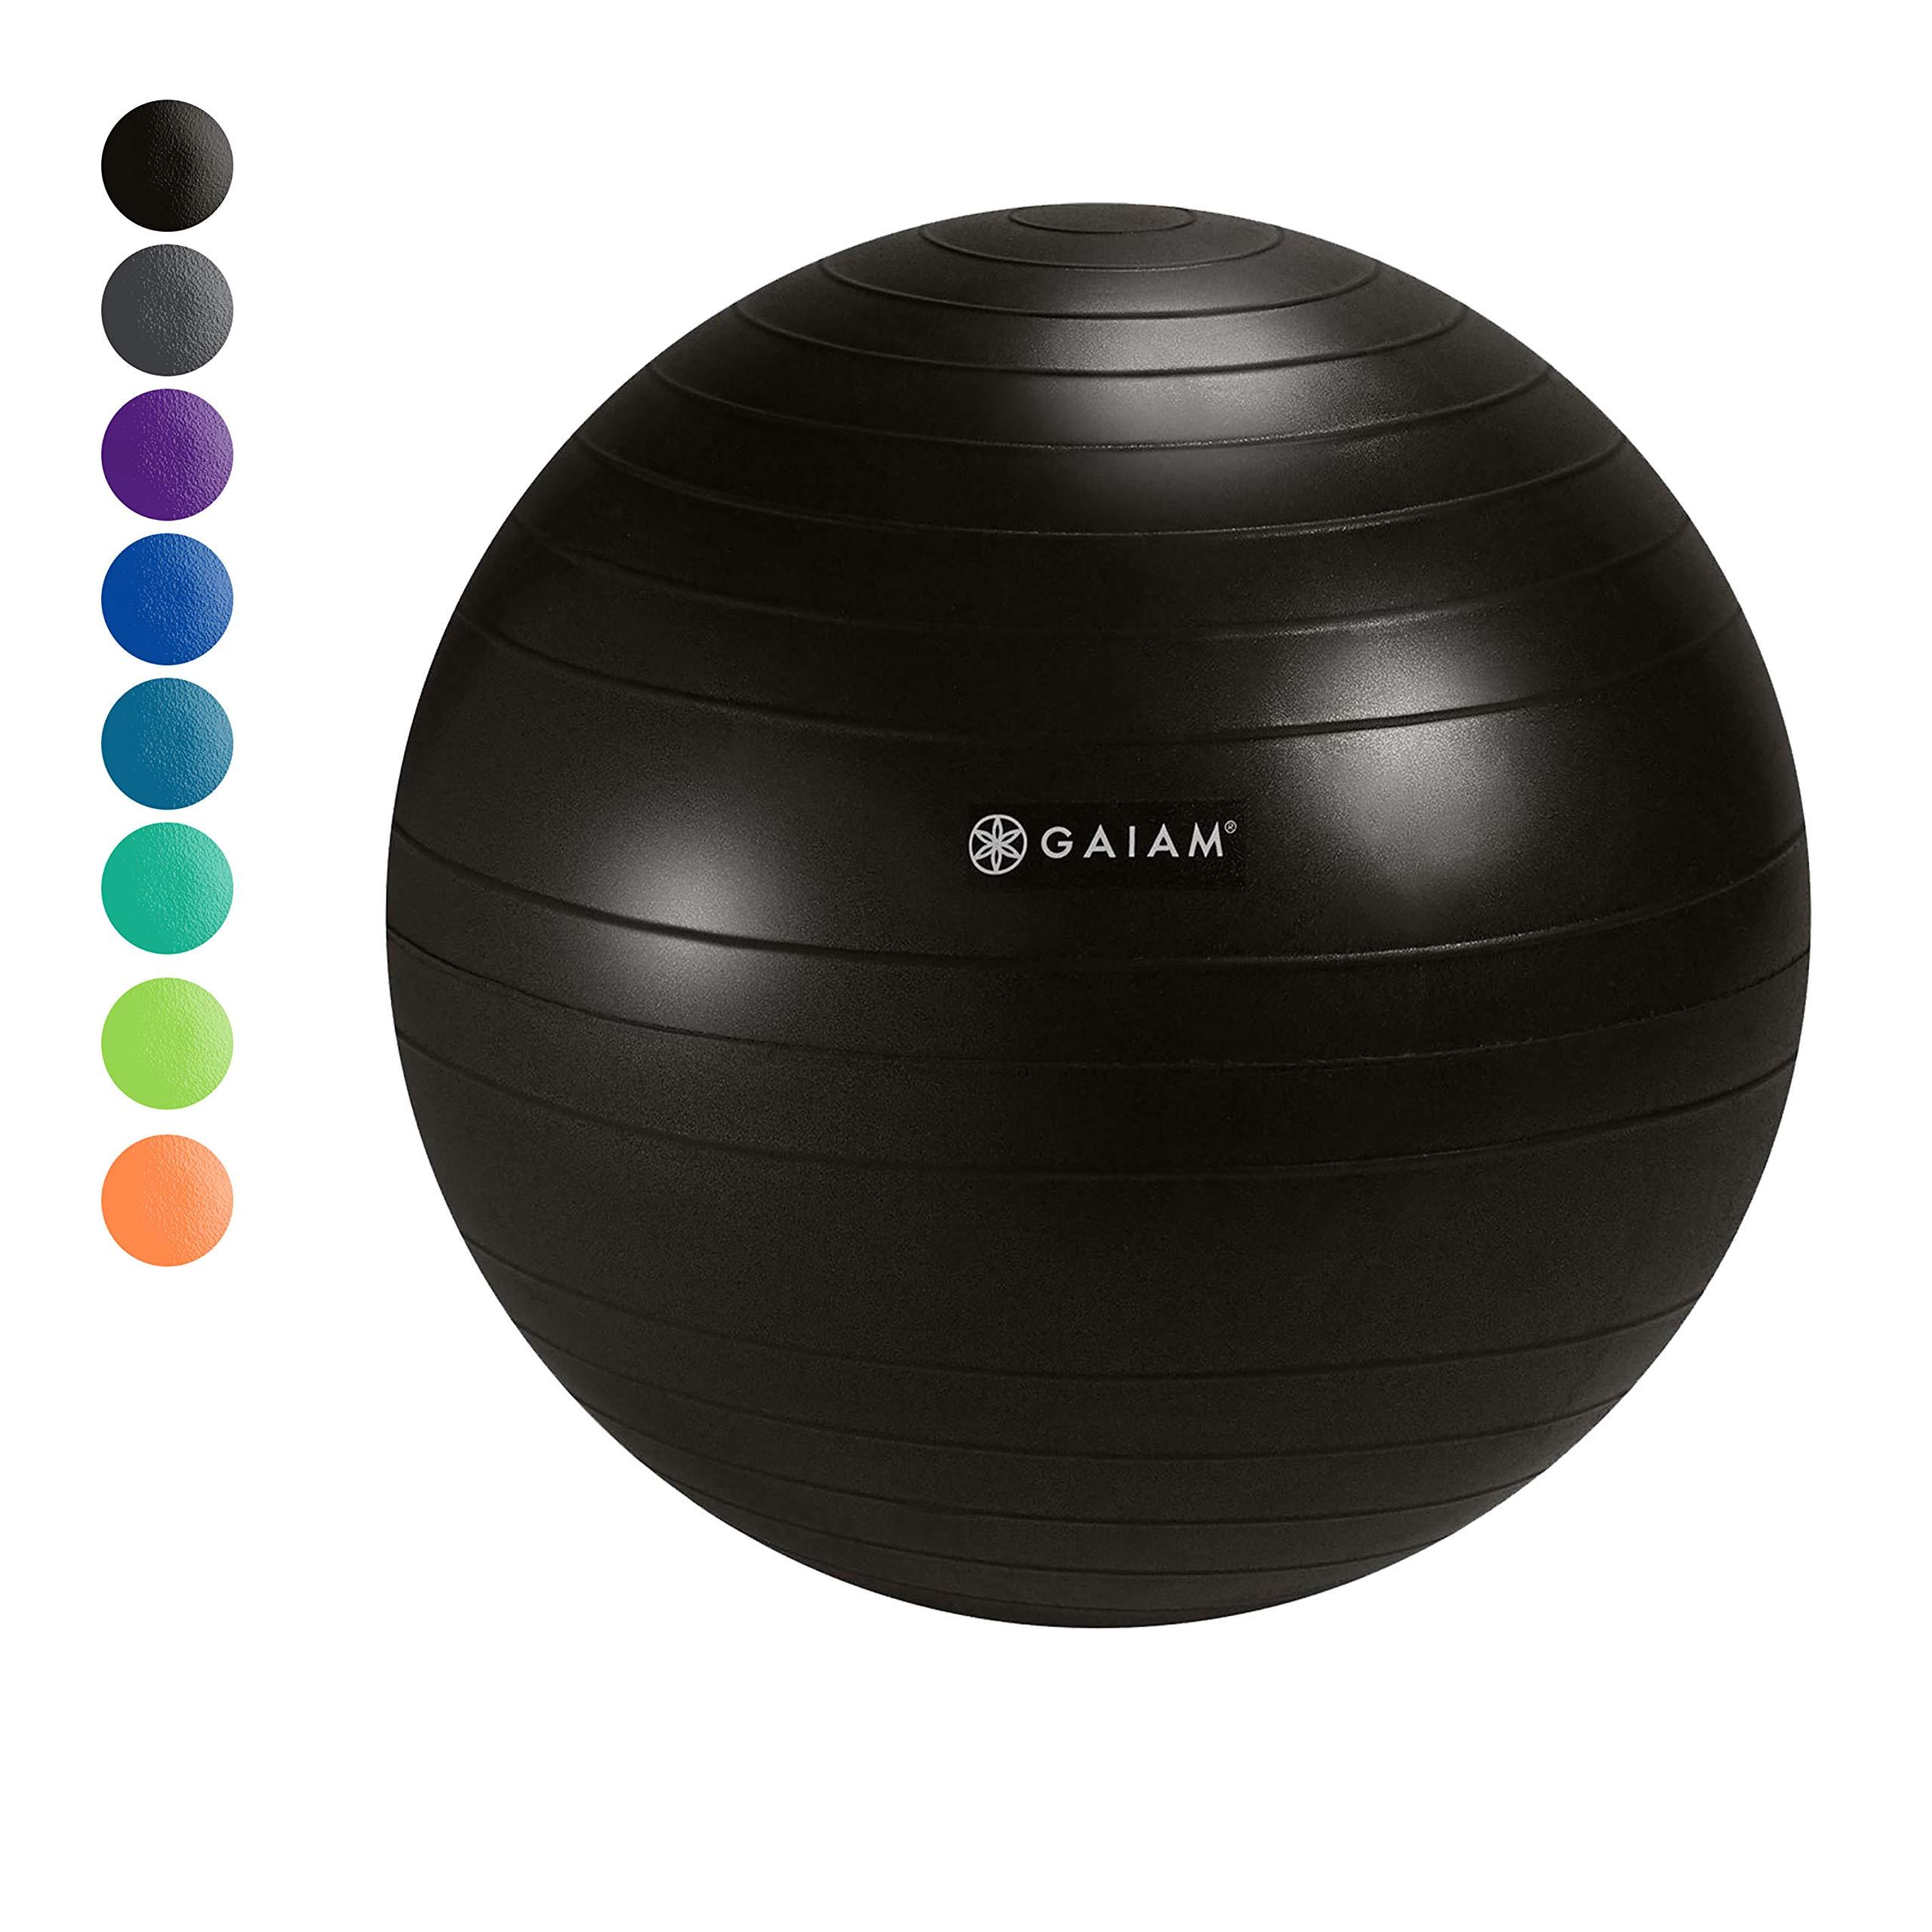 Gaiam Classic Balance Ball Chair Ball - Extra 52cm Balance Ball for Classic Balance Ball Chairs, Glossy Black, Hand pump included